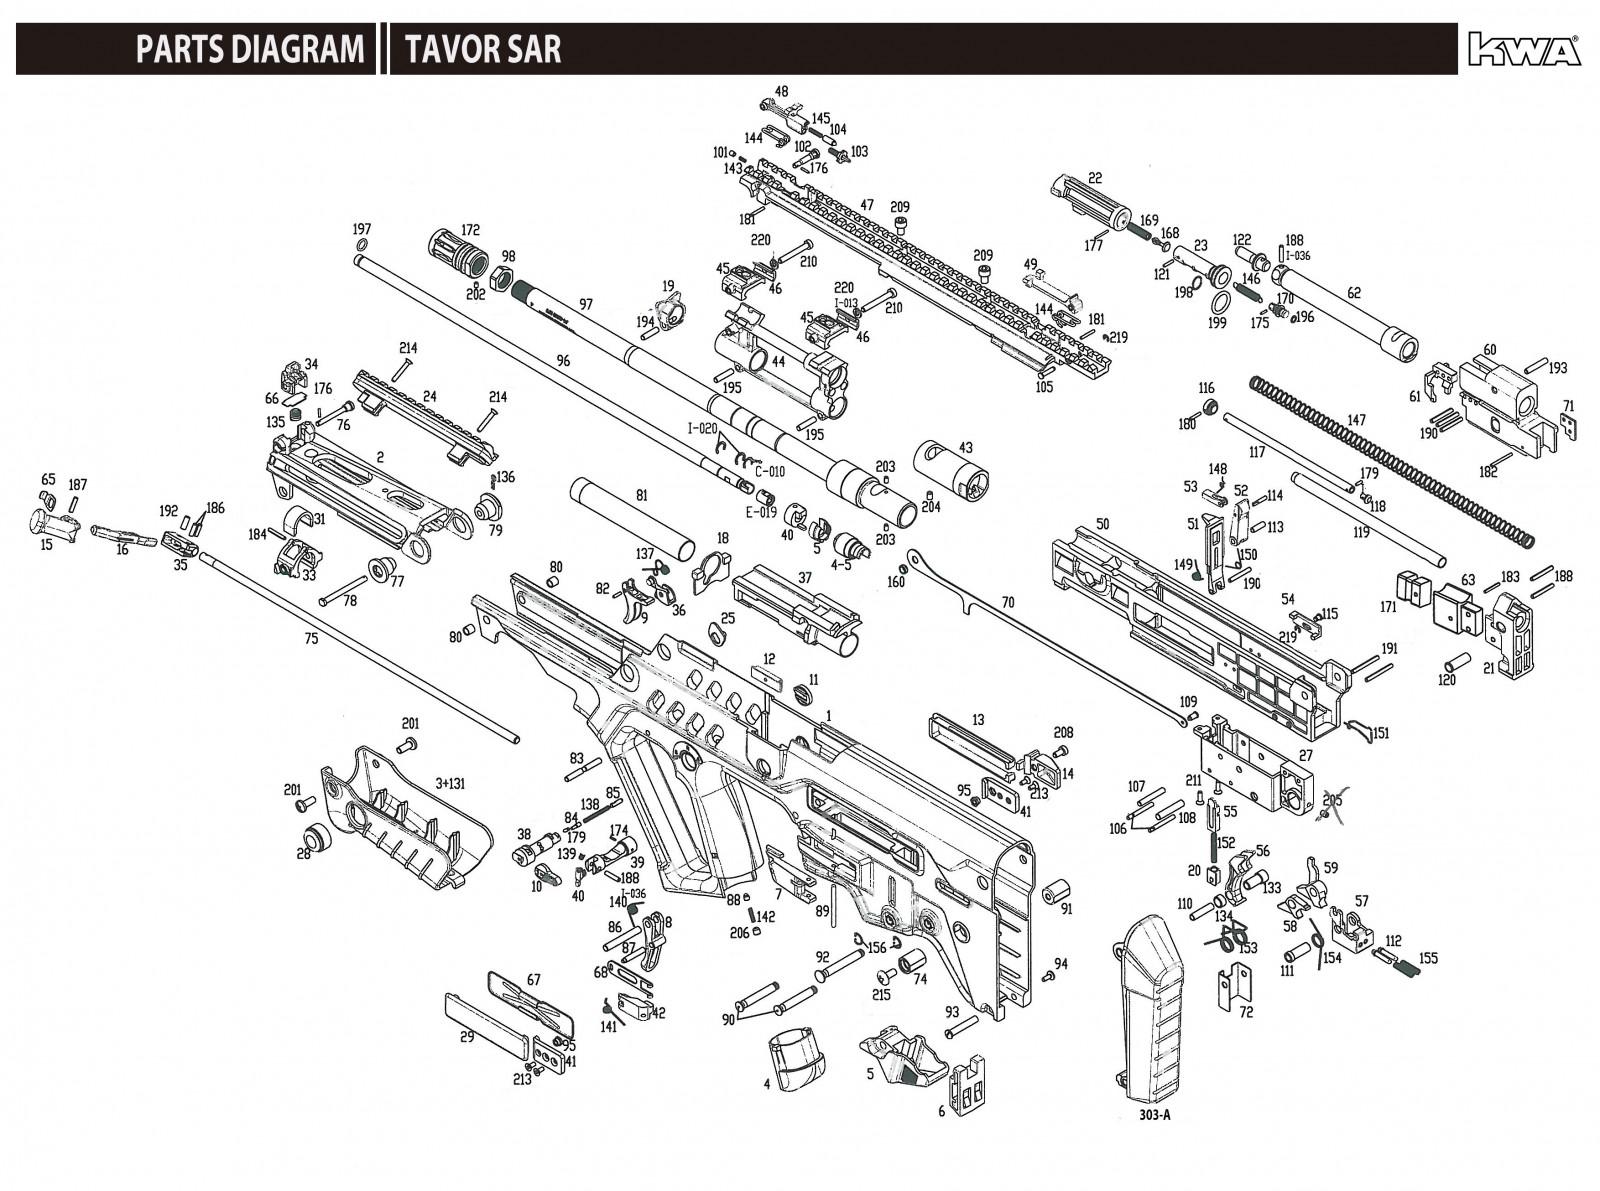 Kwa Tavor Exploded Diagram Ksc Part Original